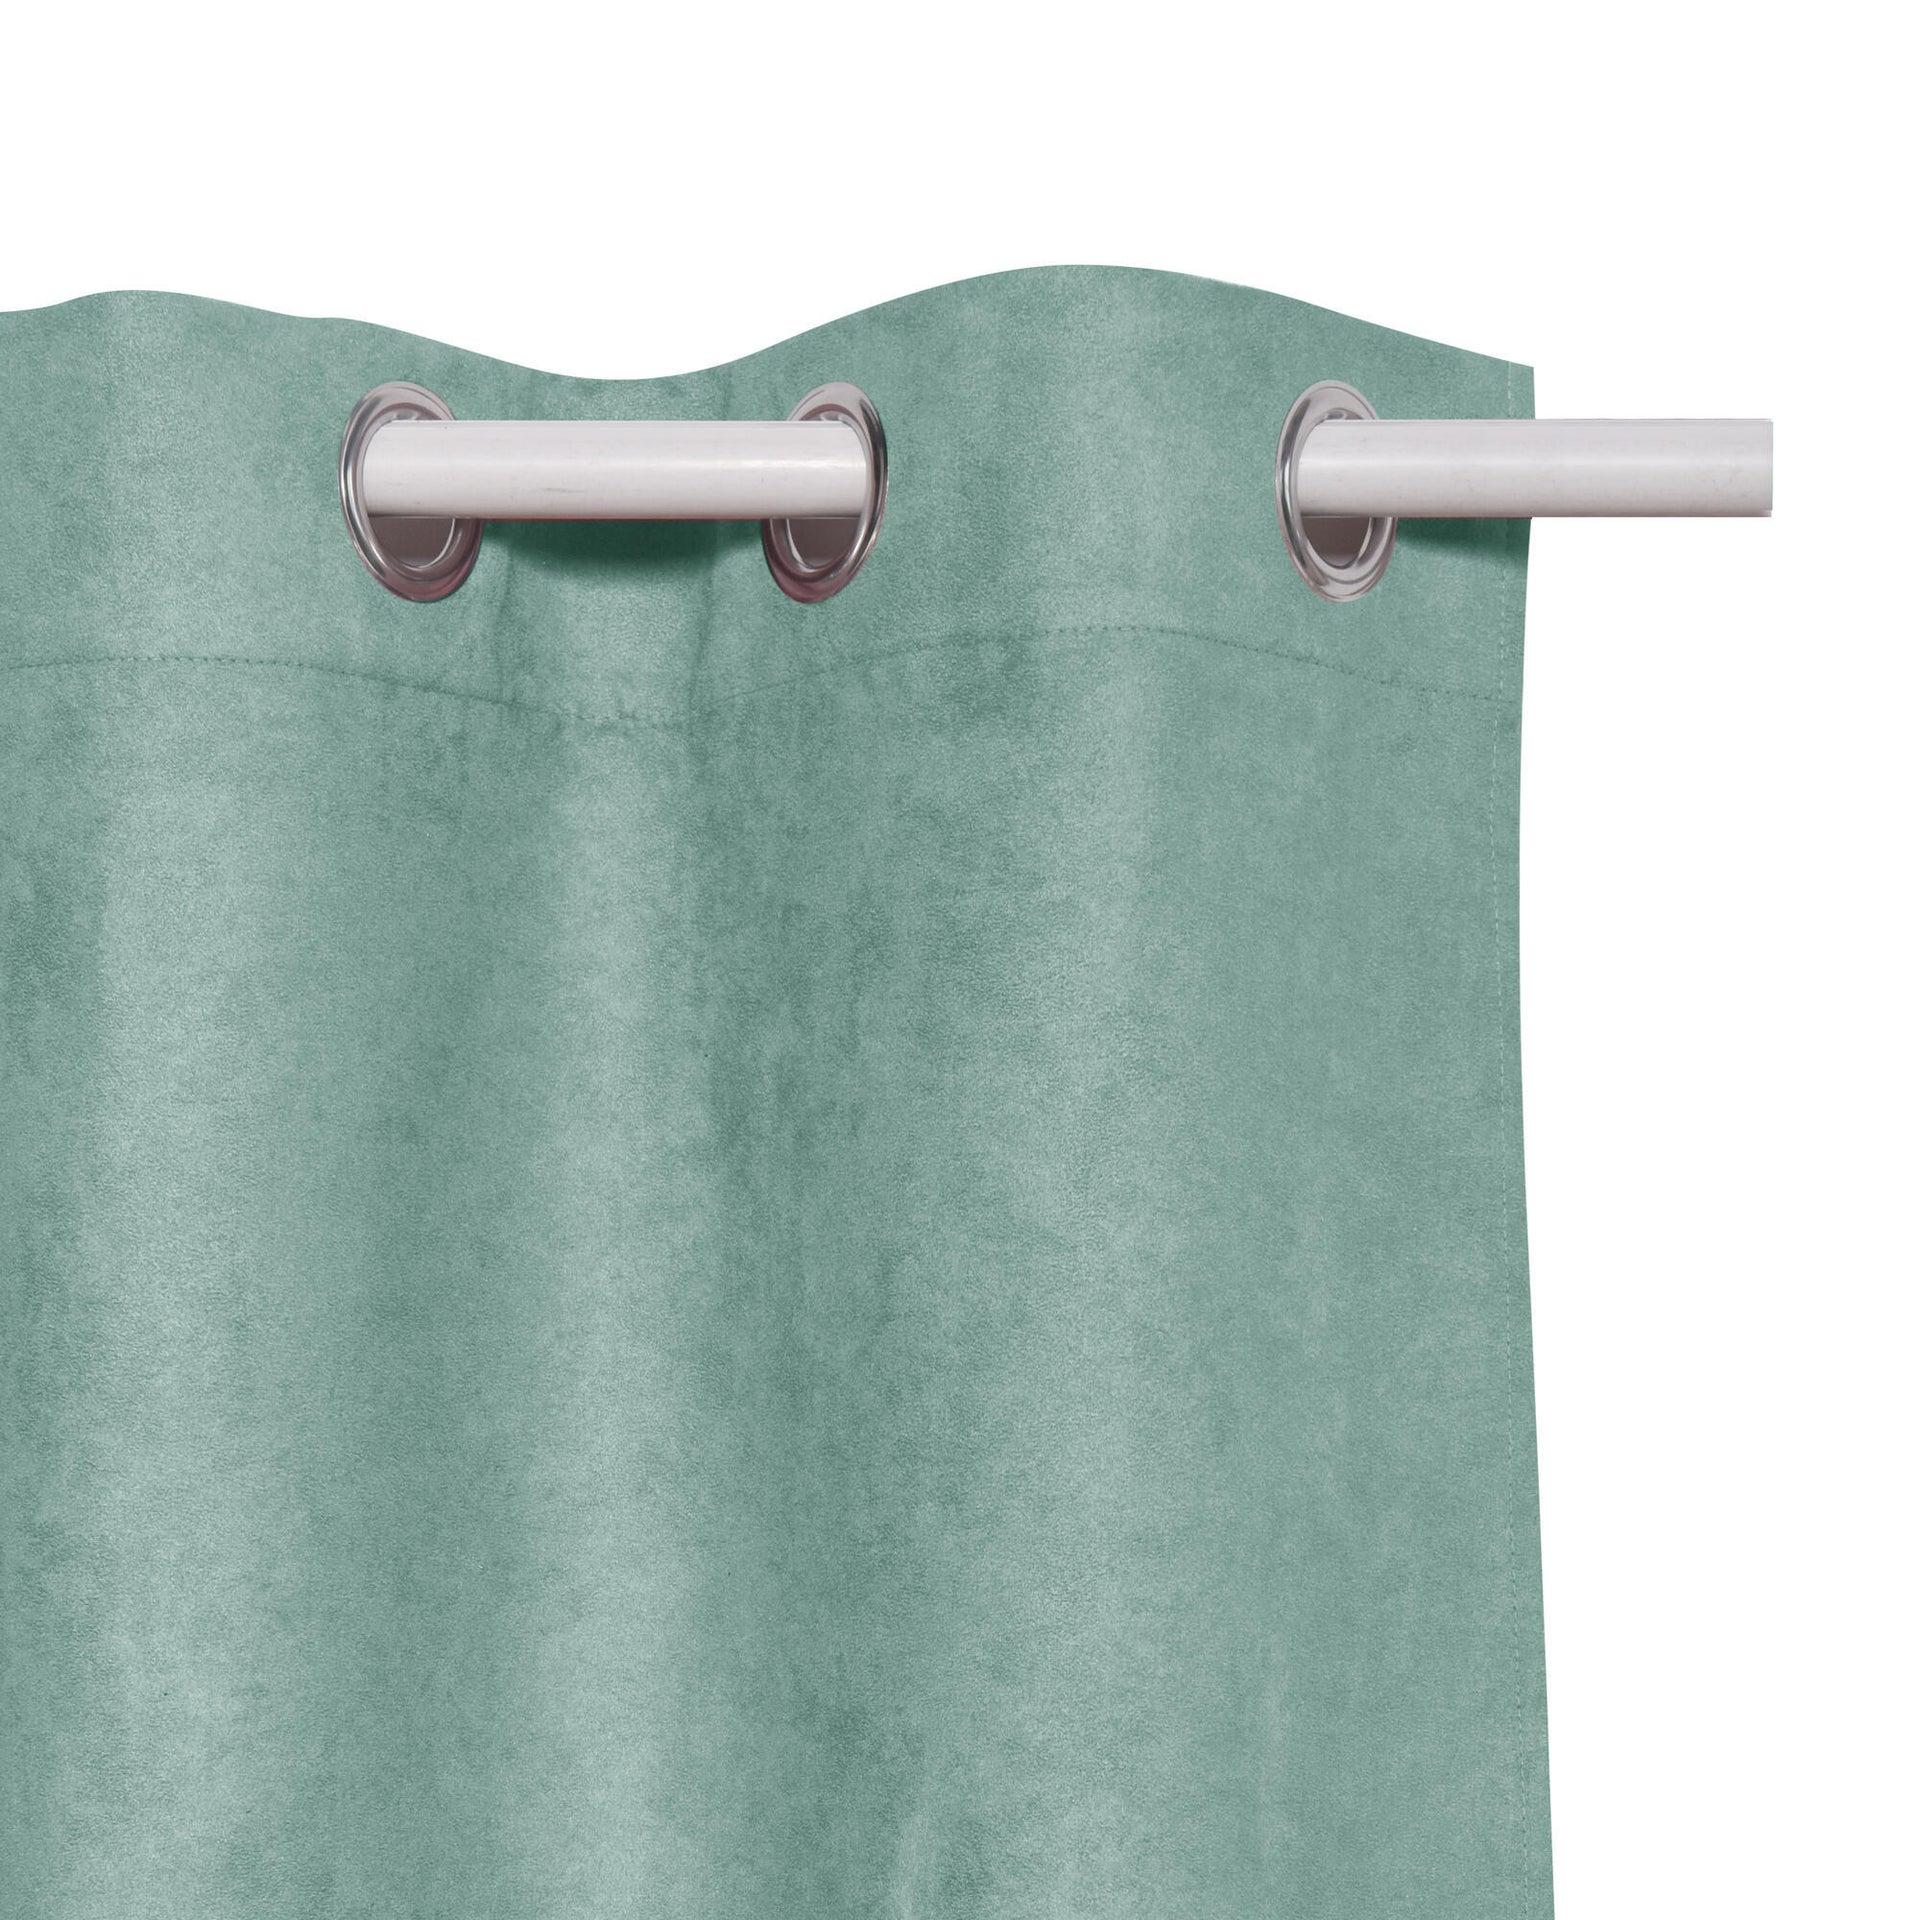 Tenda INSPIRE New Manchester verde occhielli 140 x 280 cm - 9